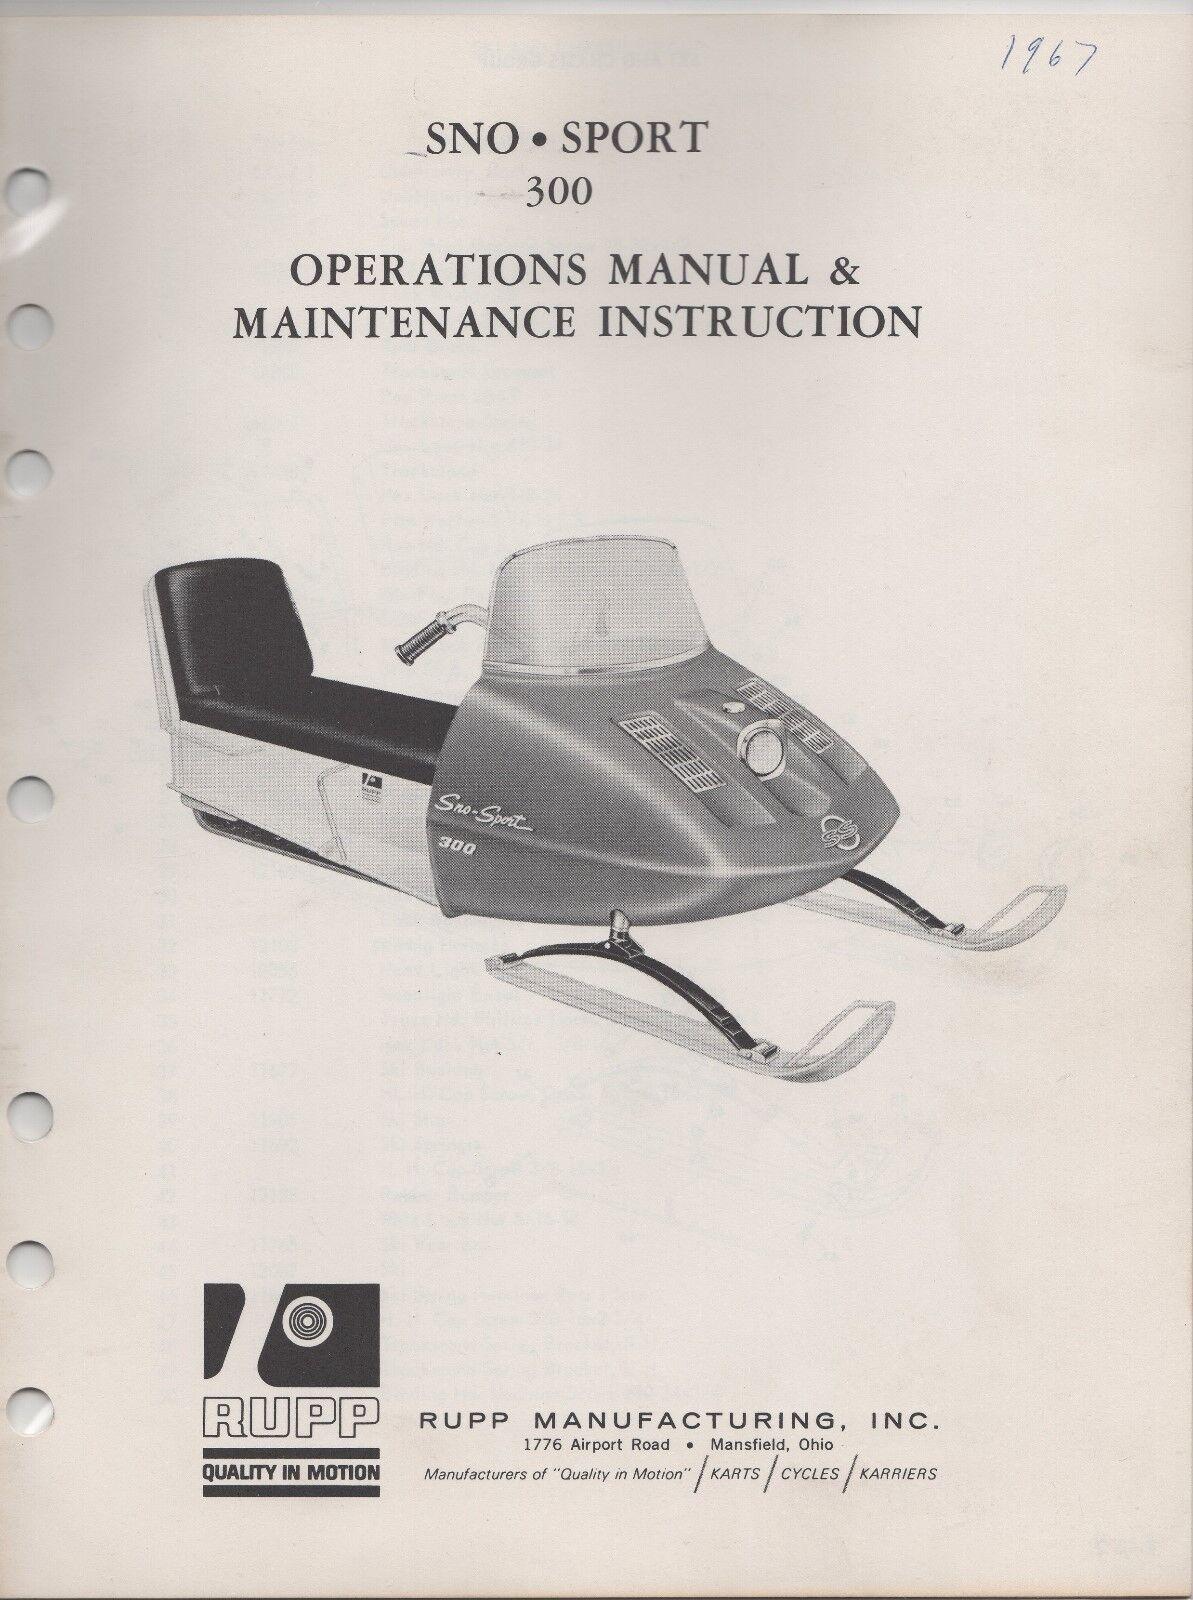 1967 RUPP SNOWMOBILE  SNO-SPORT 300 OPERATIONS ,MAINTENANCE MANUAL (647)  new sadie